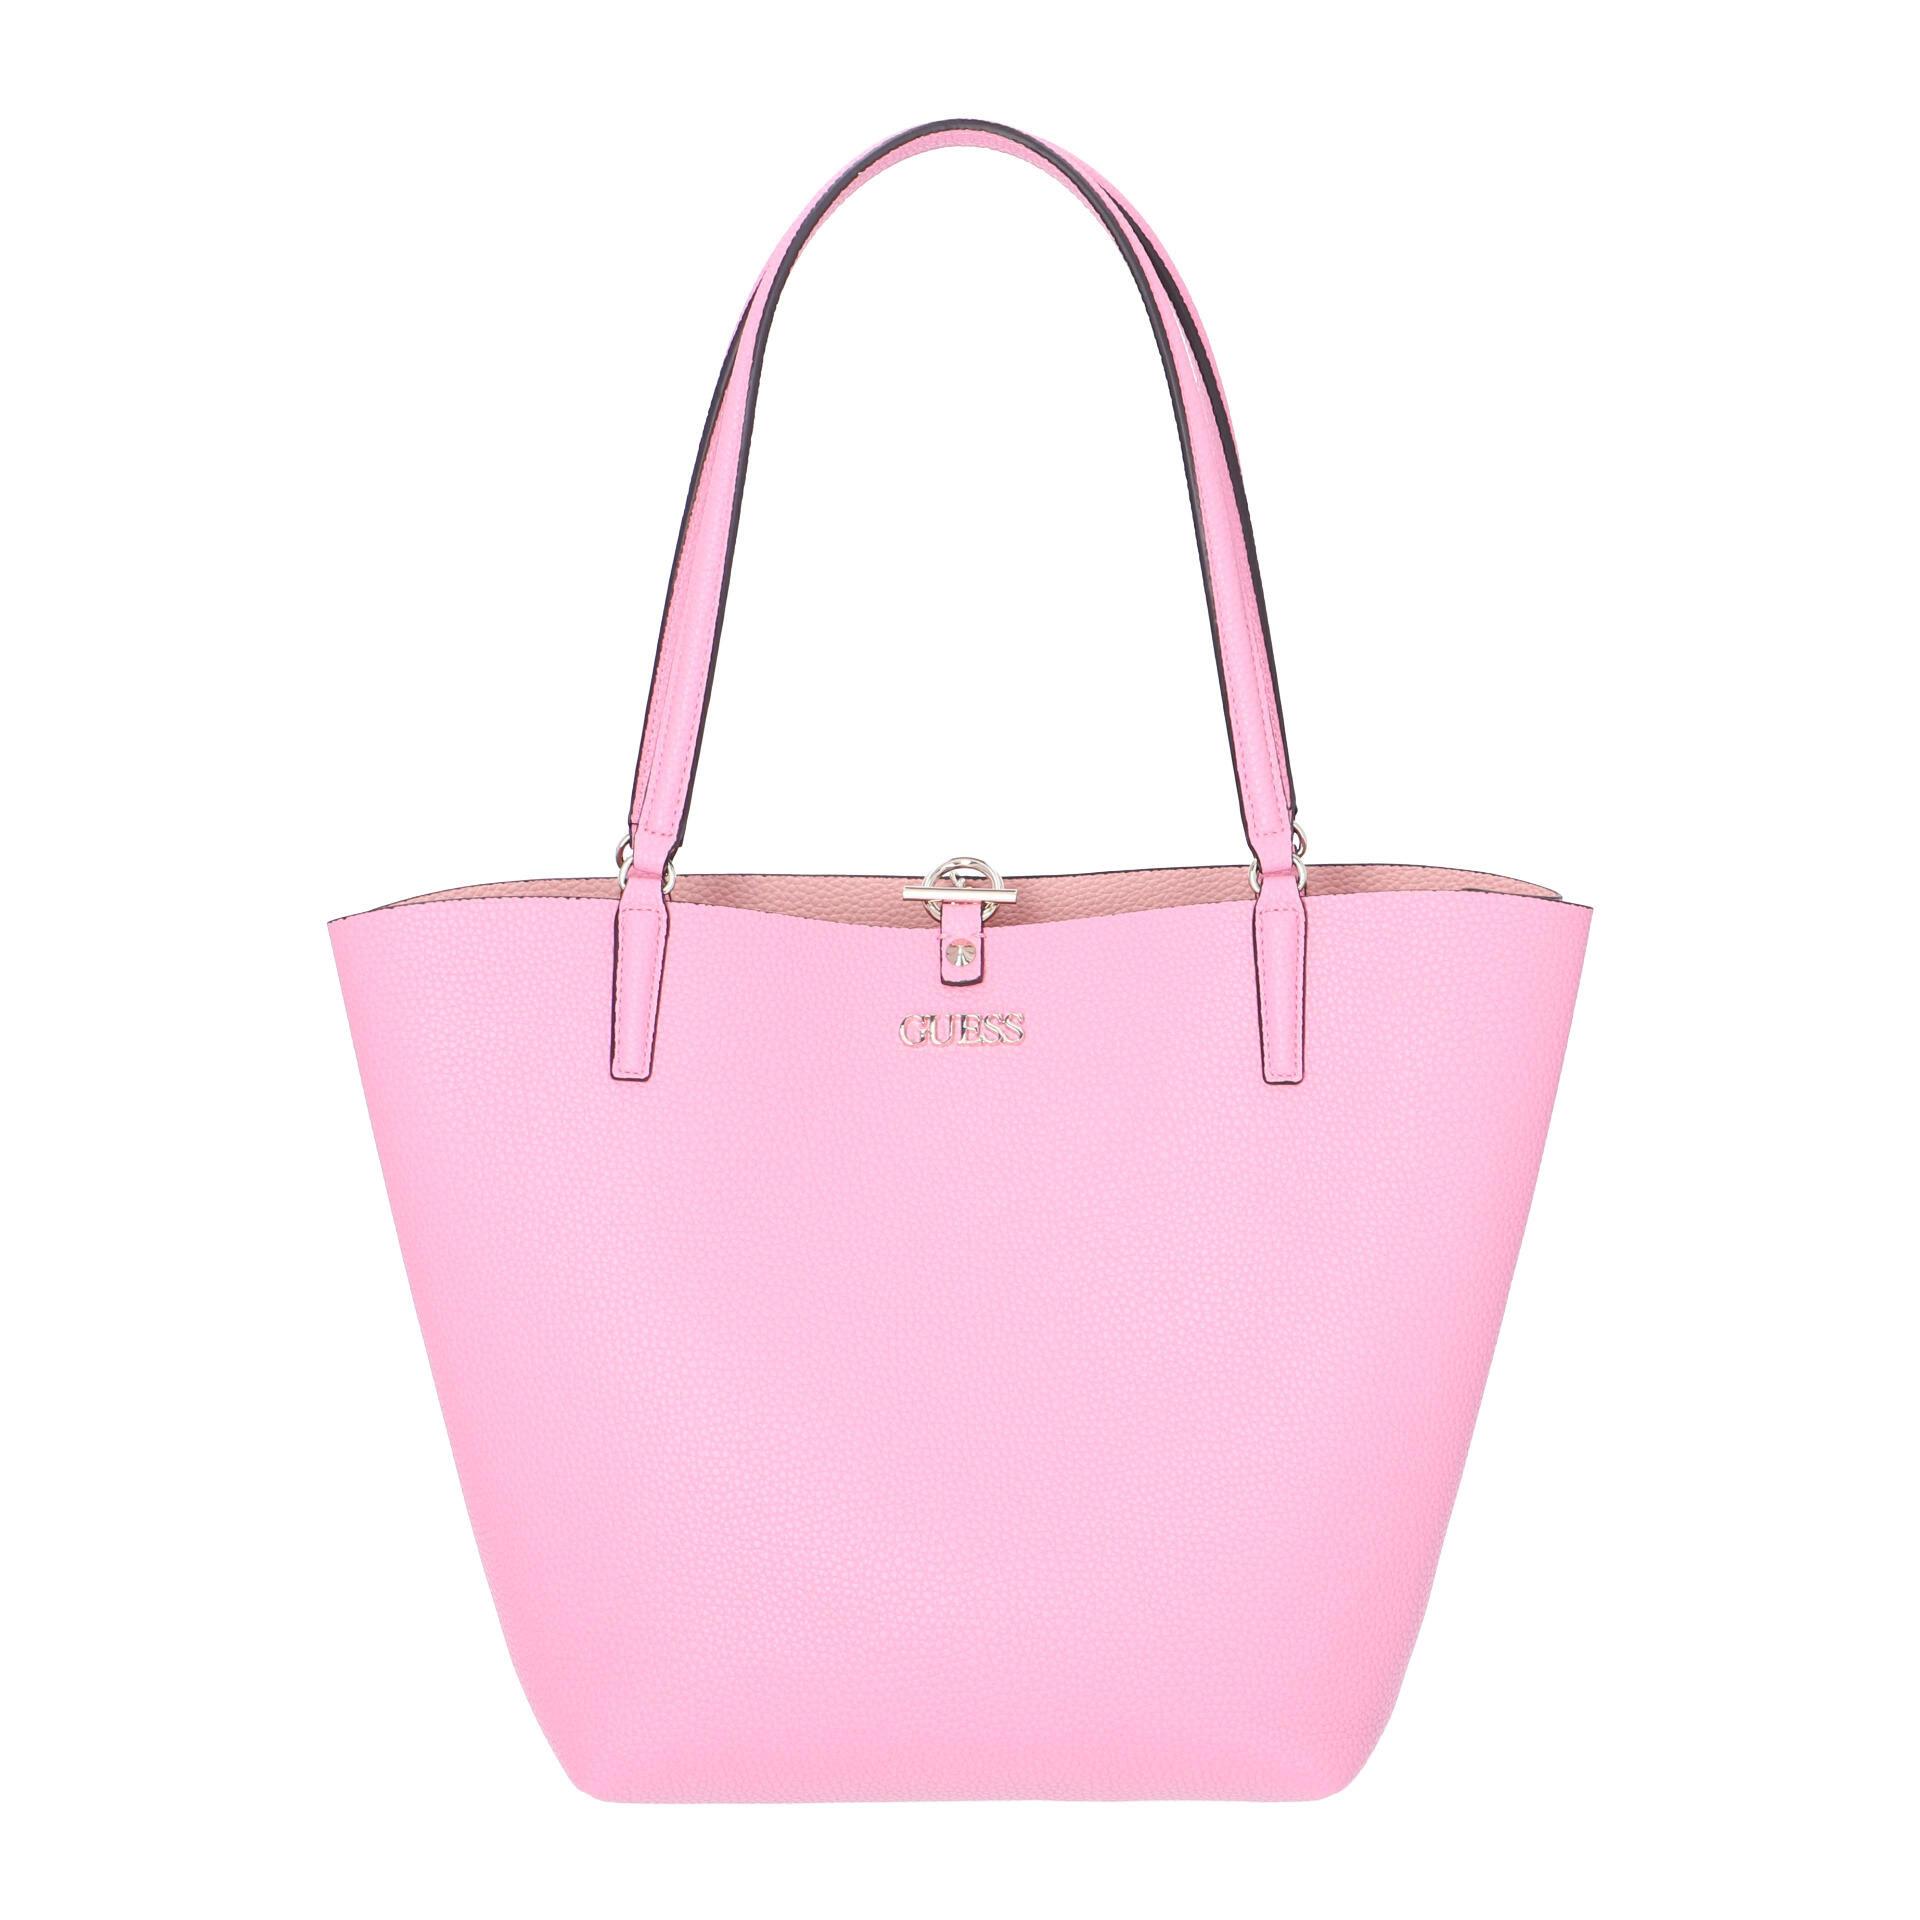 Guess Alby Shopper mit herausnehmbarer Pochette pink